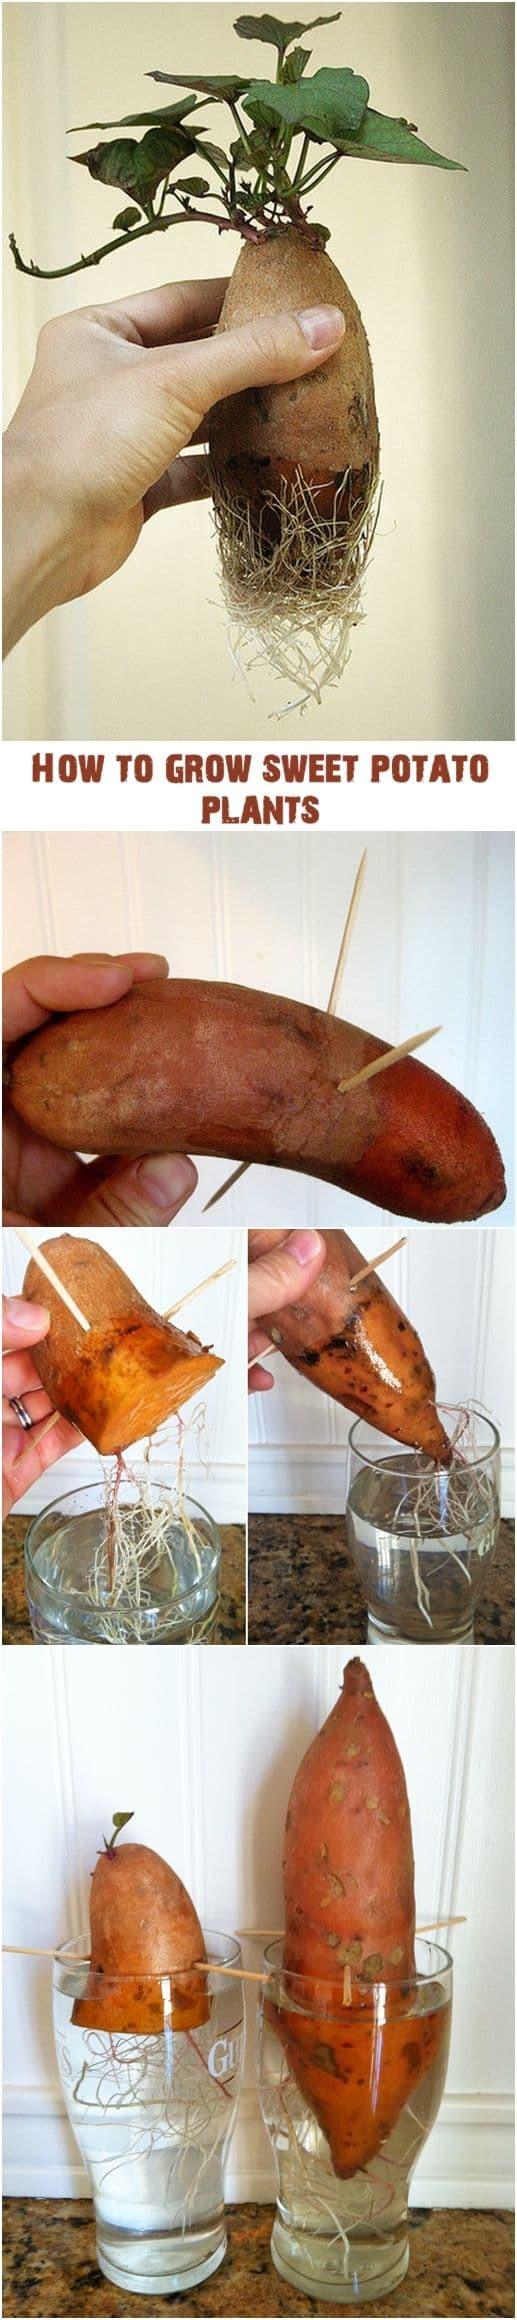 How To Grow Sweet Potato Vine  How To Grow Sweet Potato Vines From Tubers Video